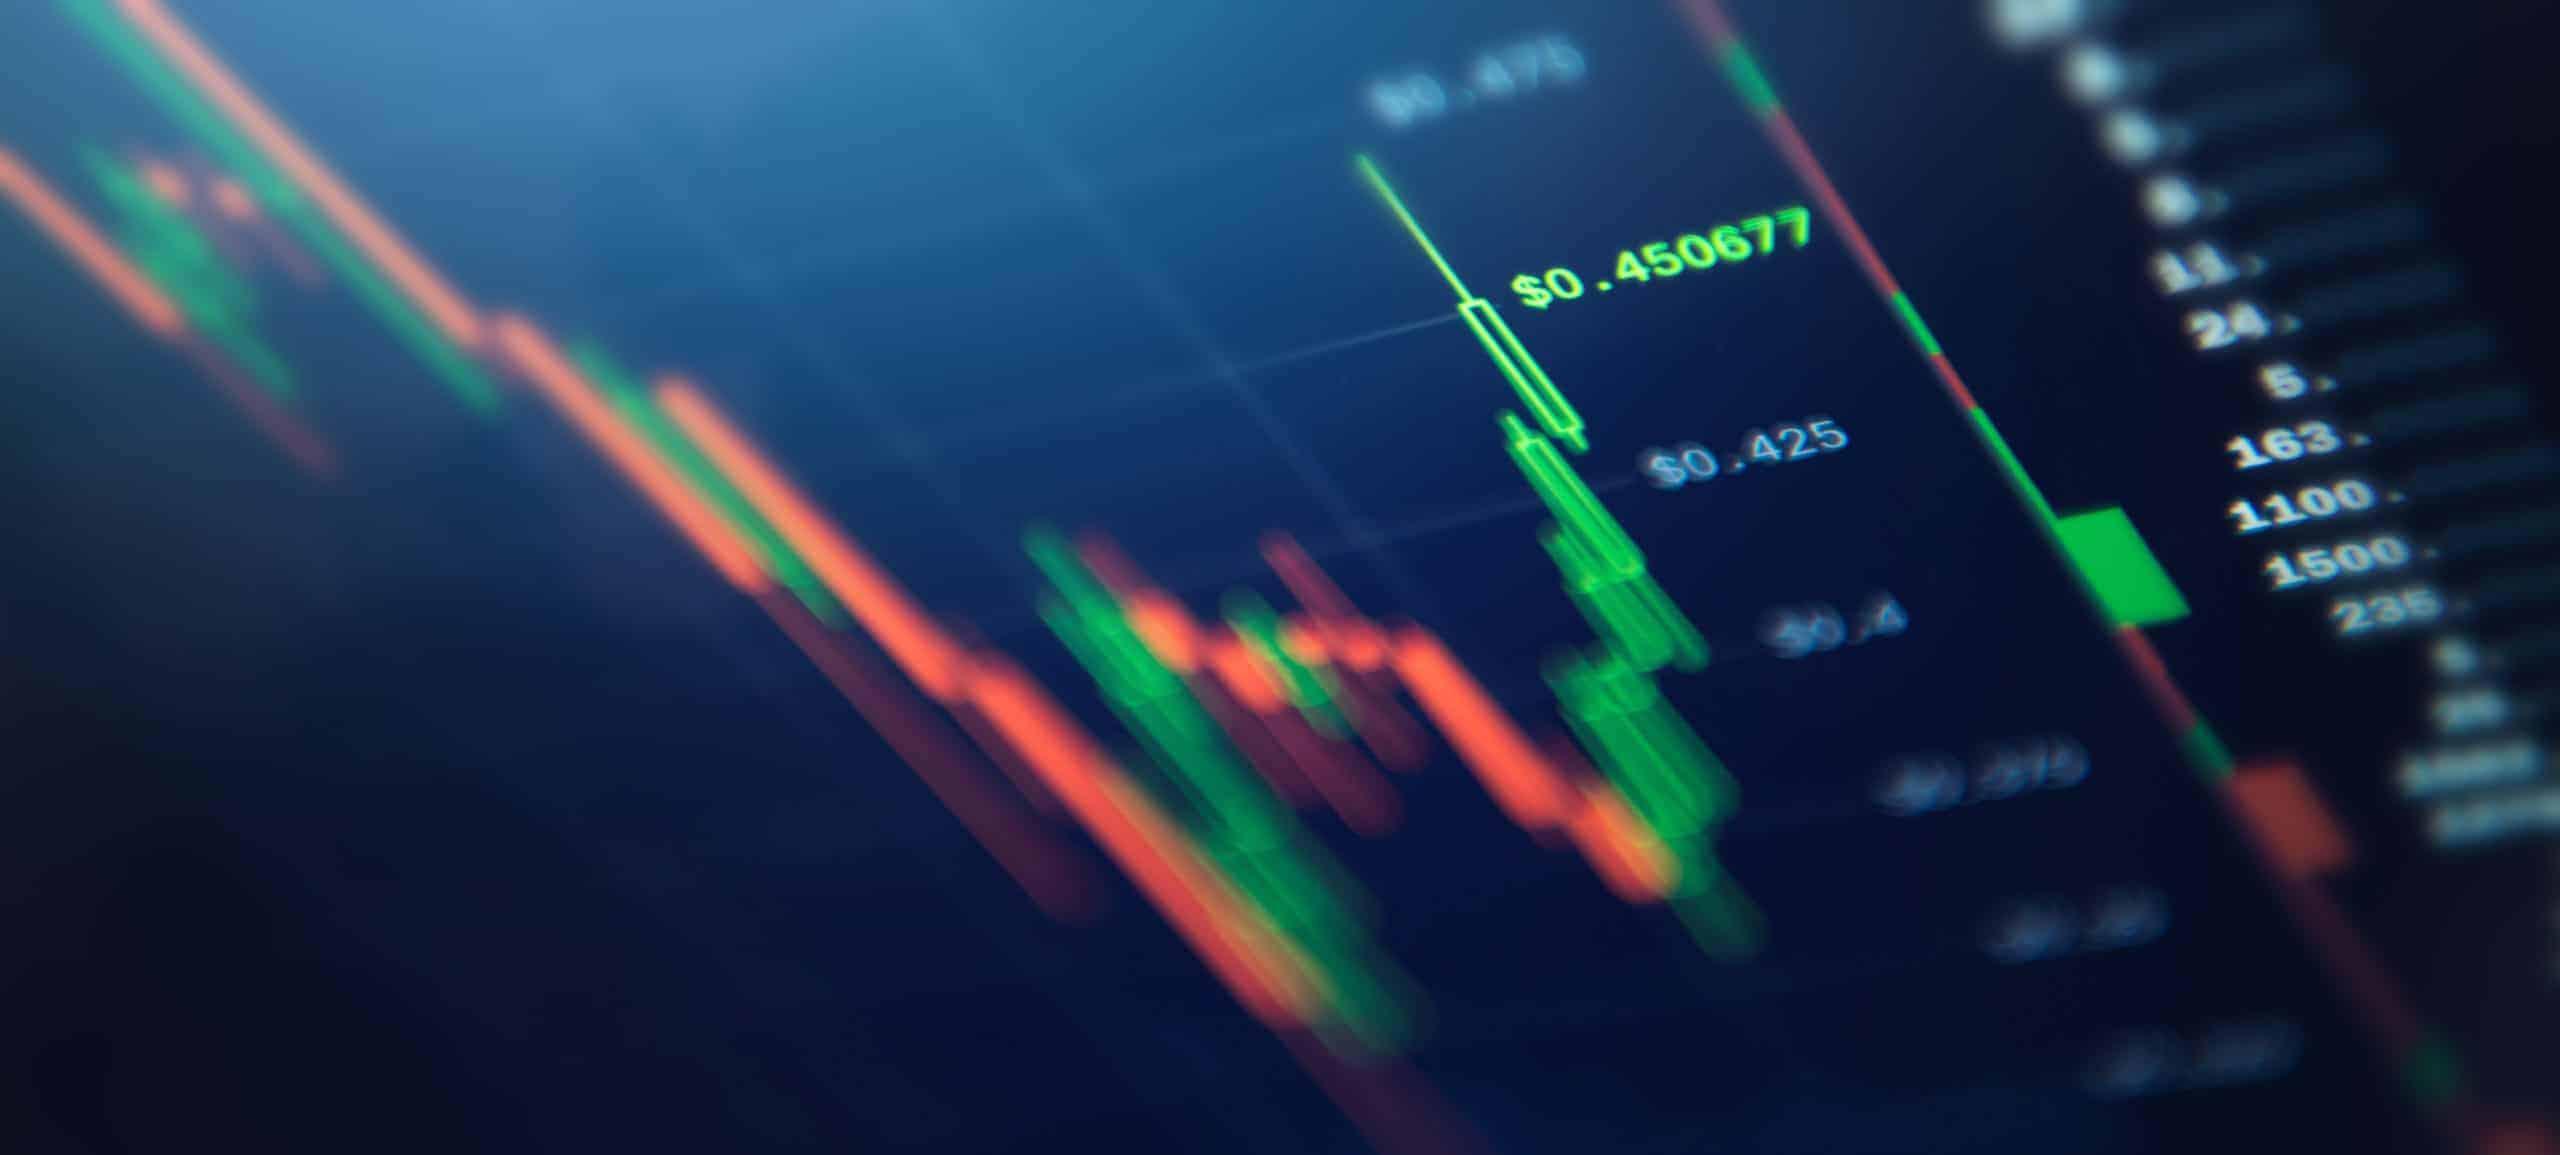 cryptocurrency trading platform software L3426JU scaled